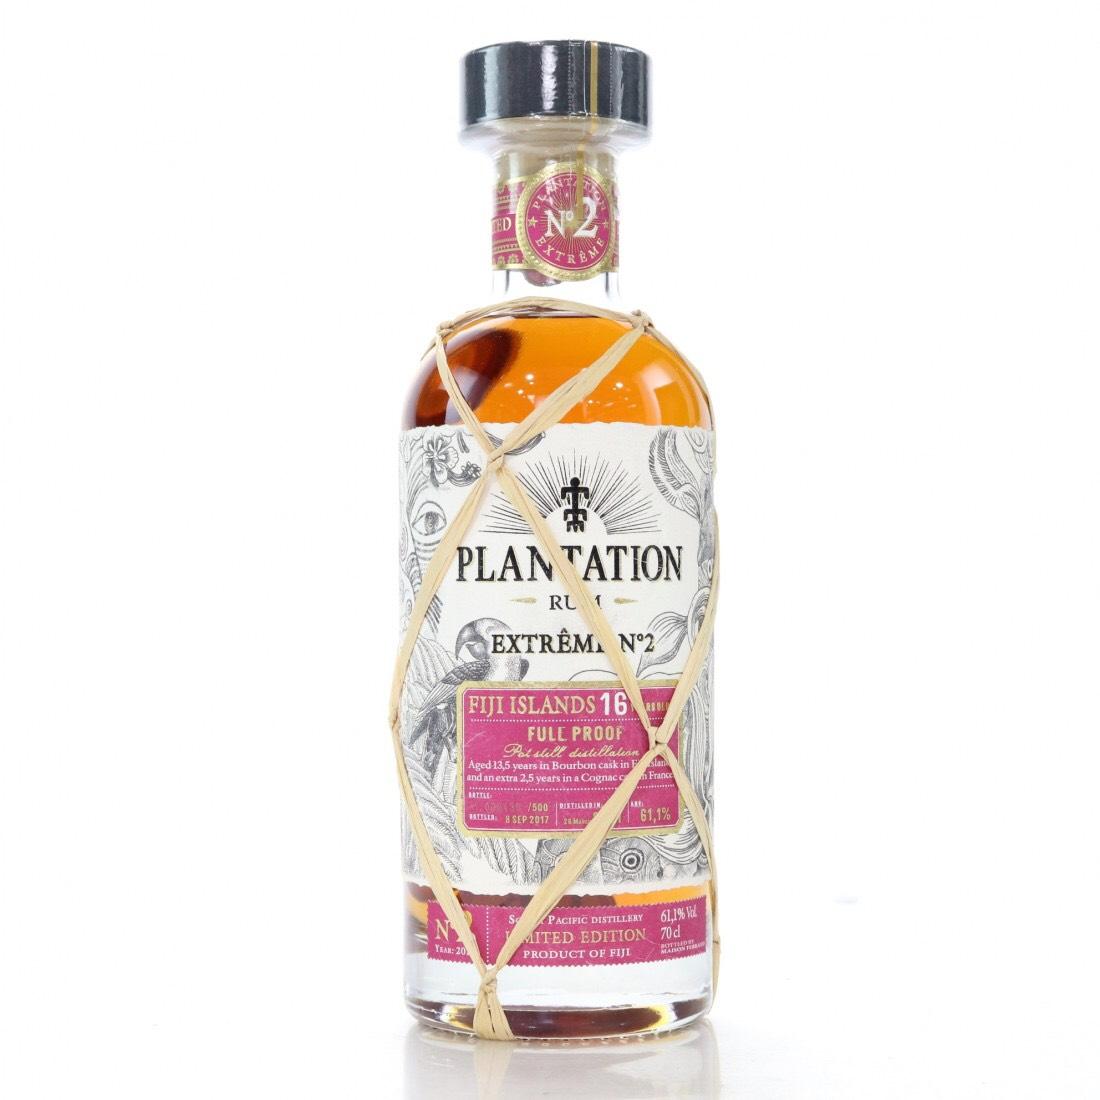 Bottle image of Plantation Extrême No. 2